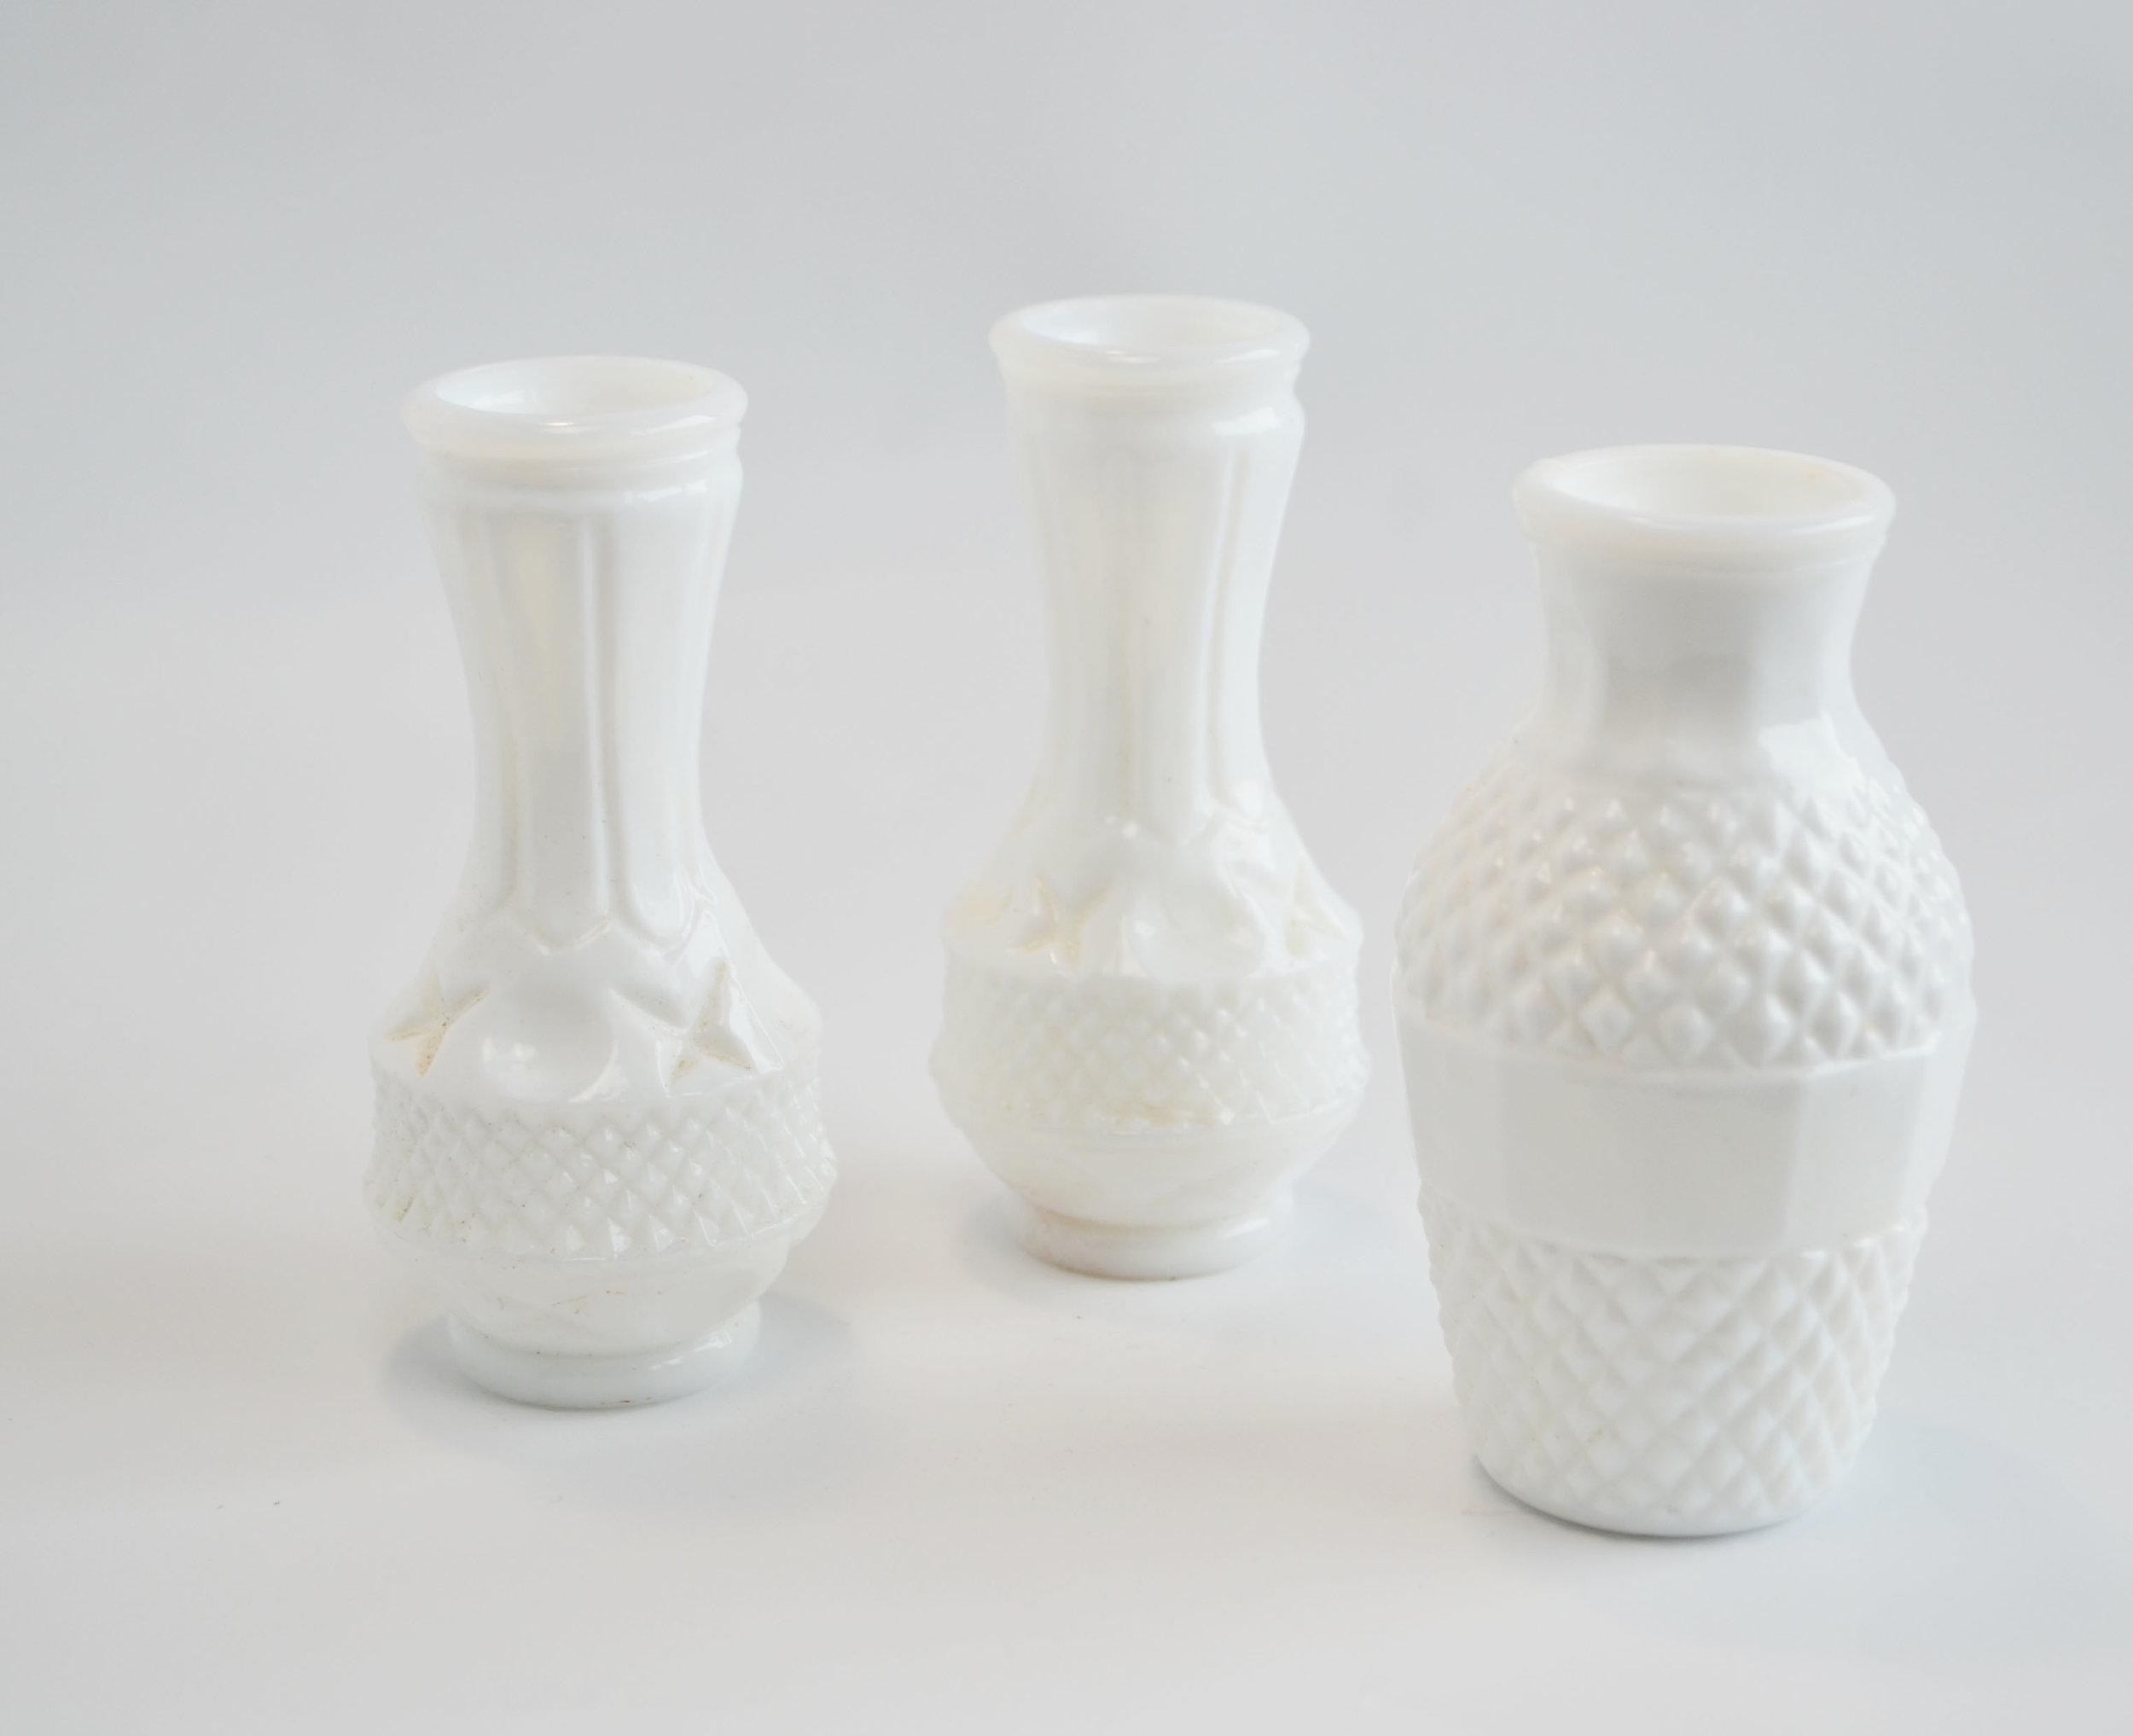 milk glass bud vase   Quantity: 18  Price: $3.50